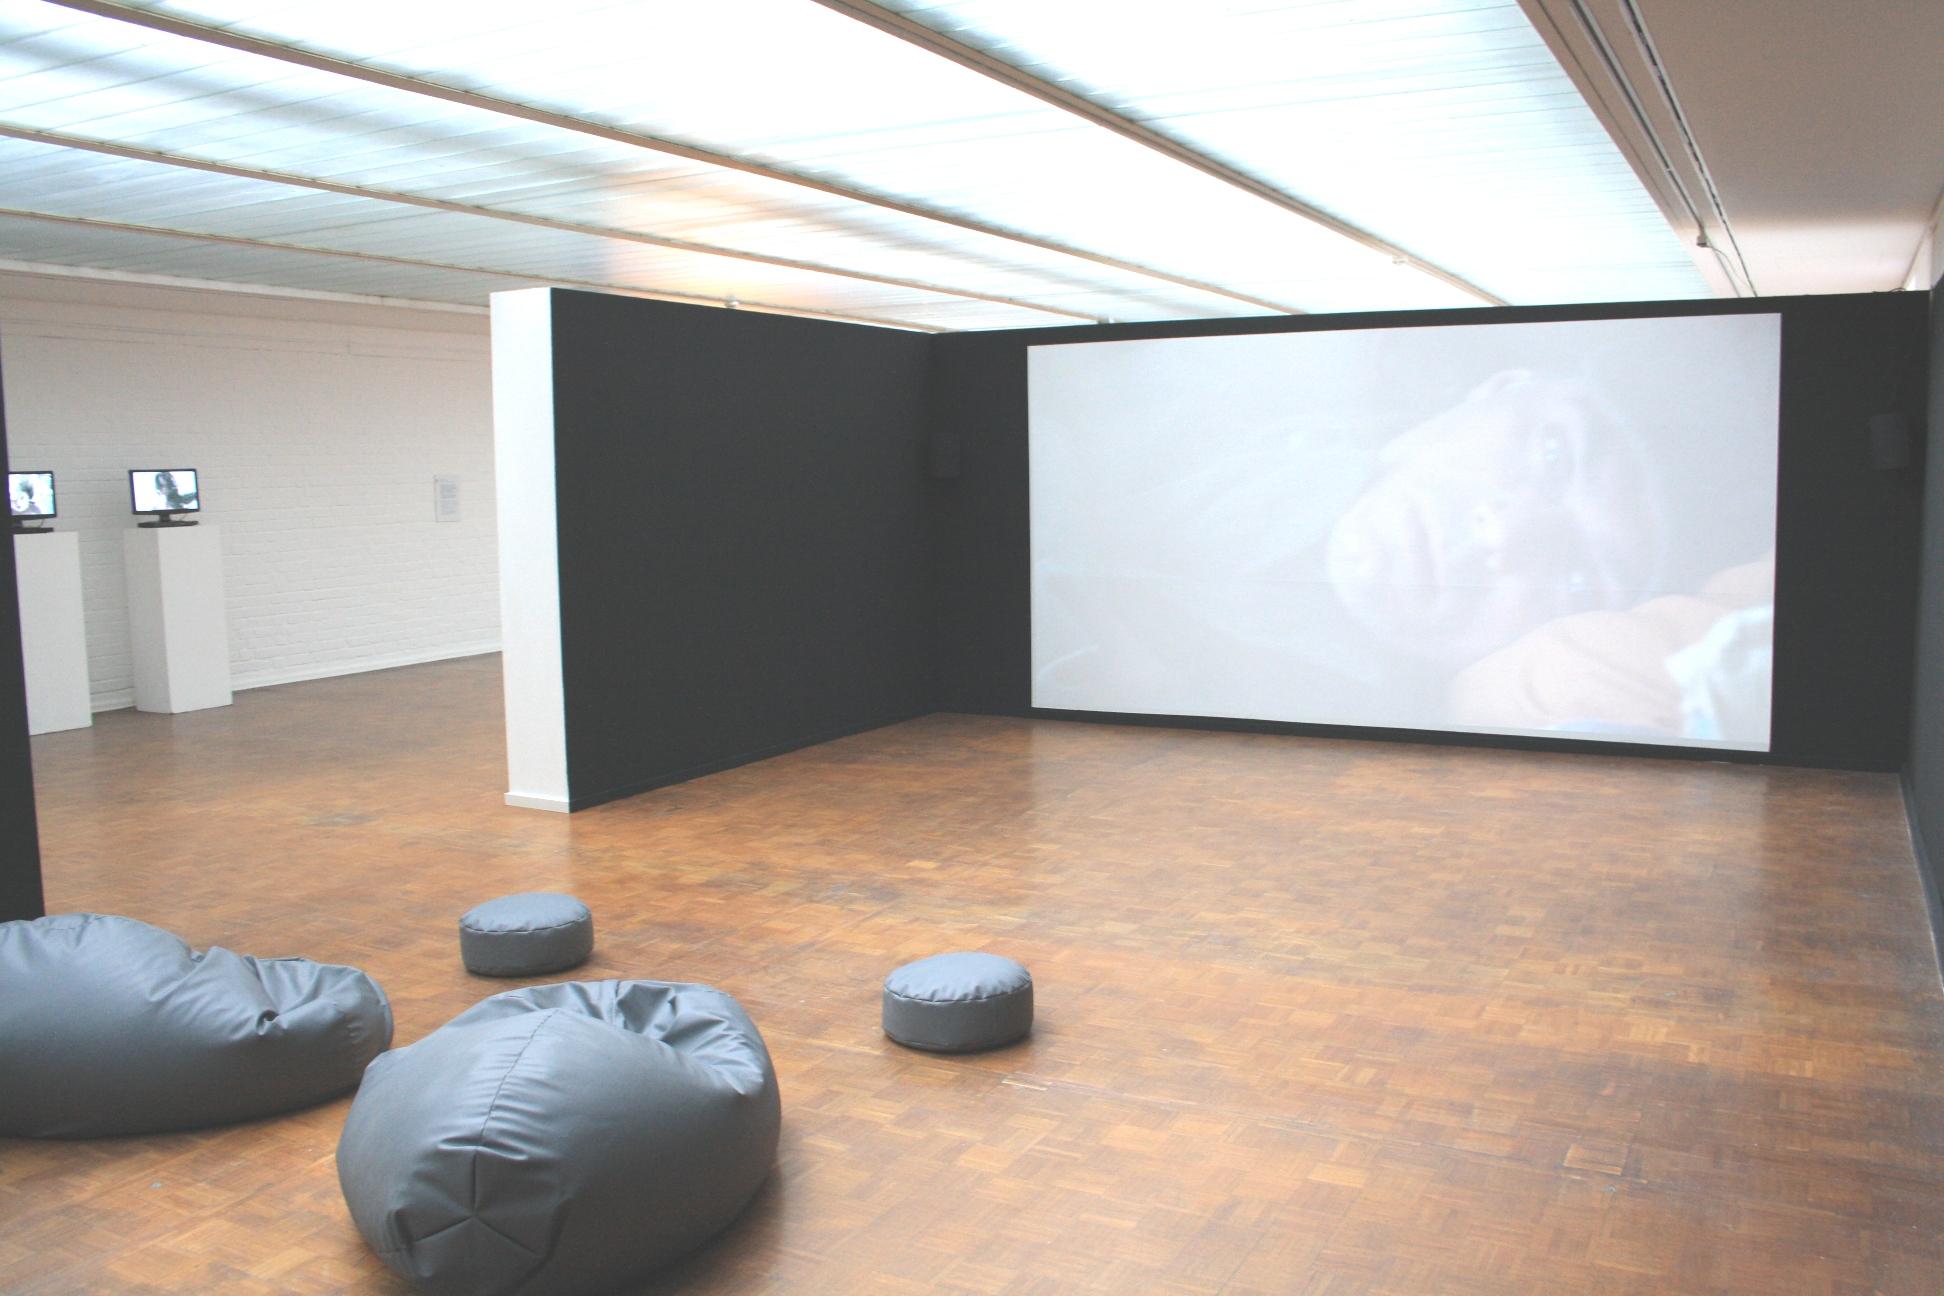 kunsthalle rostock telling the baltic. Black Bedroom Furniture Sets. Home Design Ideas